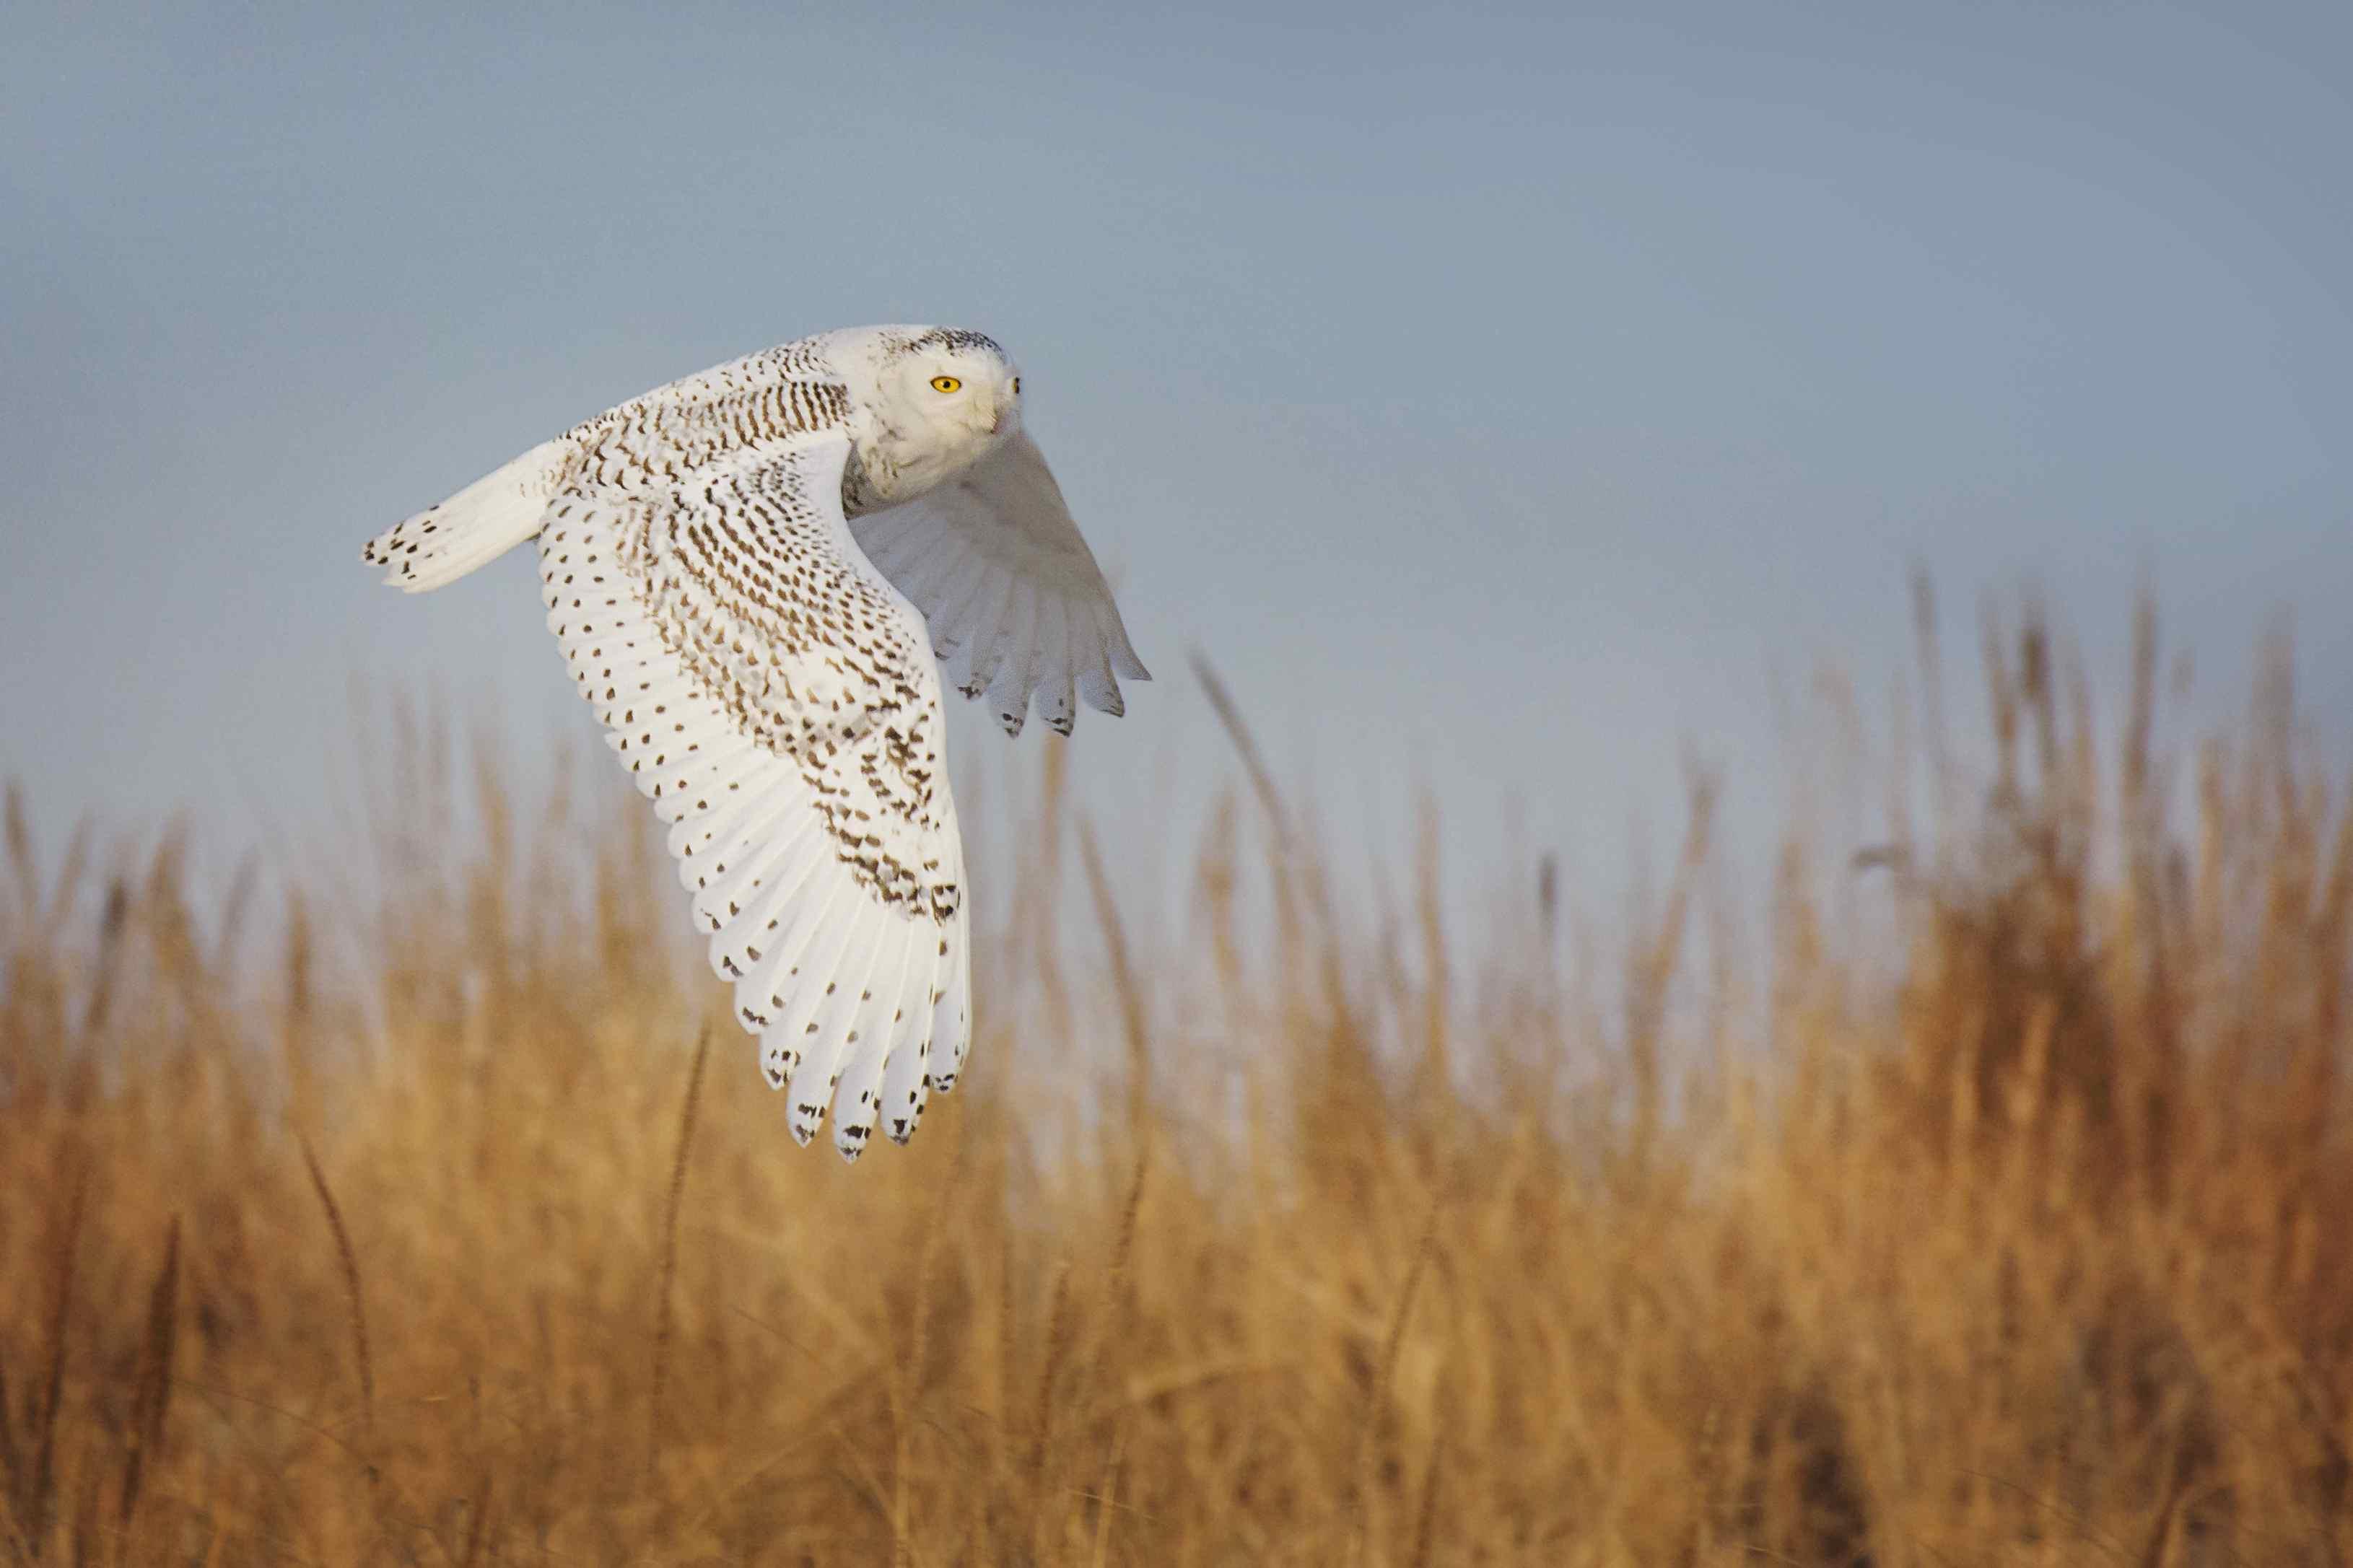 Snowy Owl in Elegant Flight Over Grass at Jones Beach, Long Island